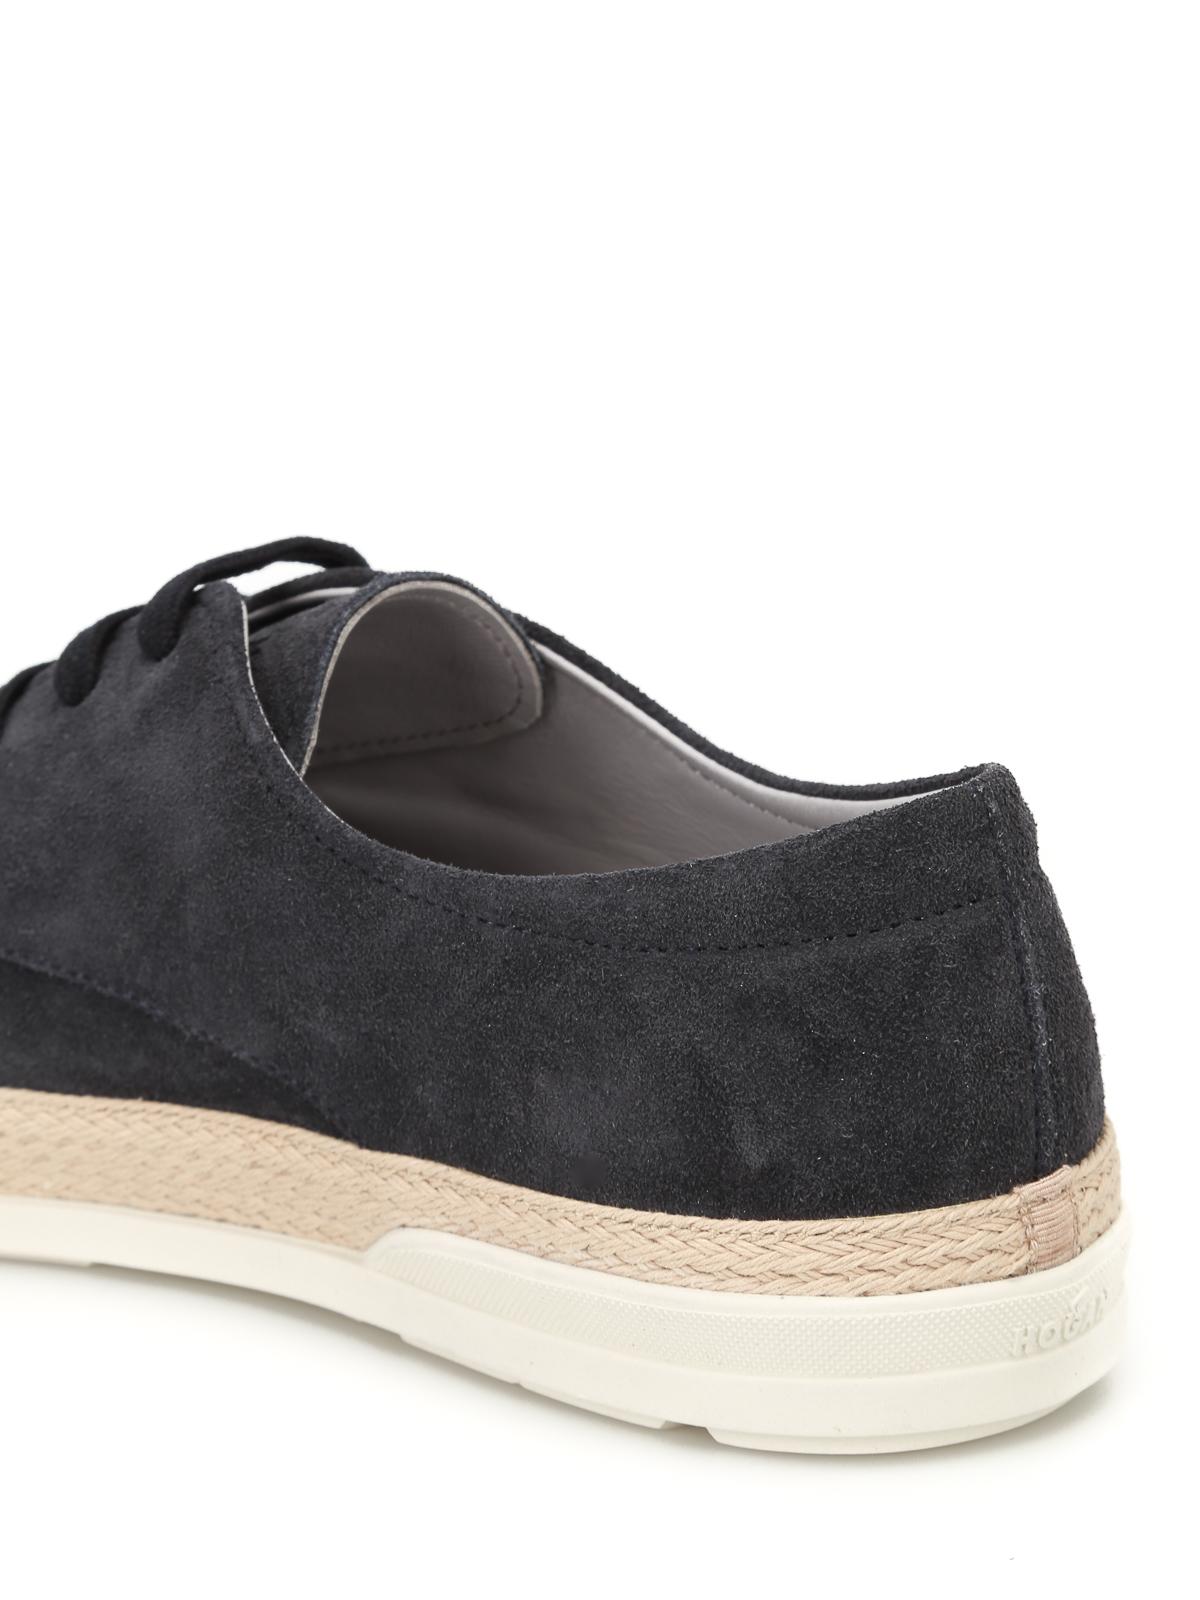 Blue H358 derby shoes Hogan Online Sale From China Cheap Sale Pick A Best Outlet Official Site KmfXdCT